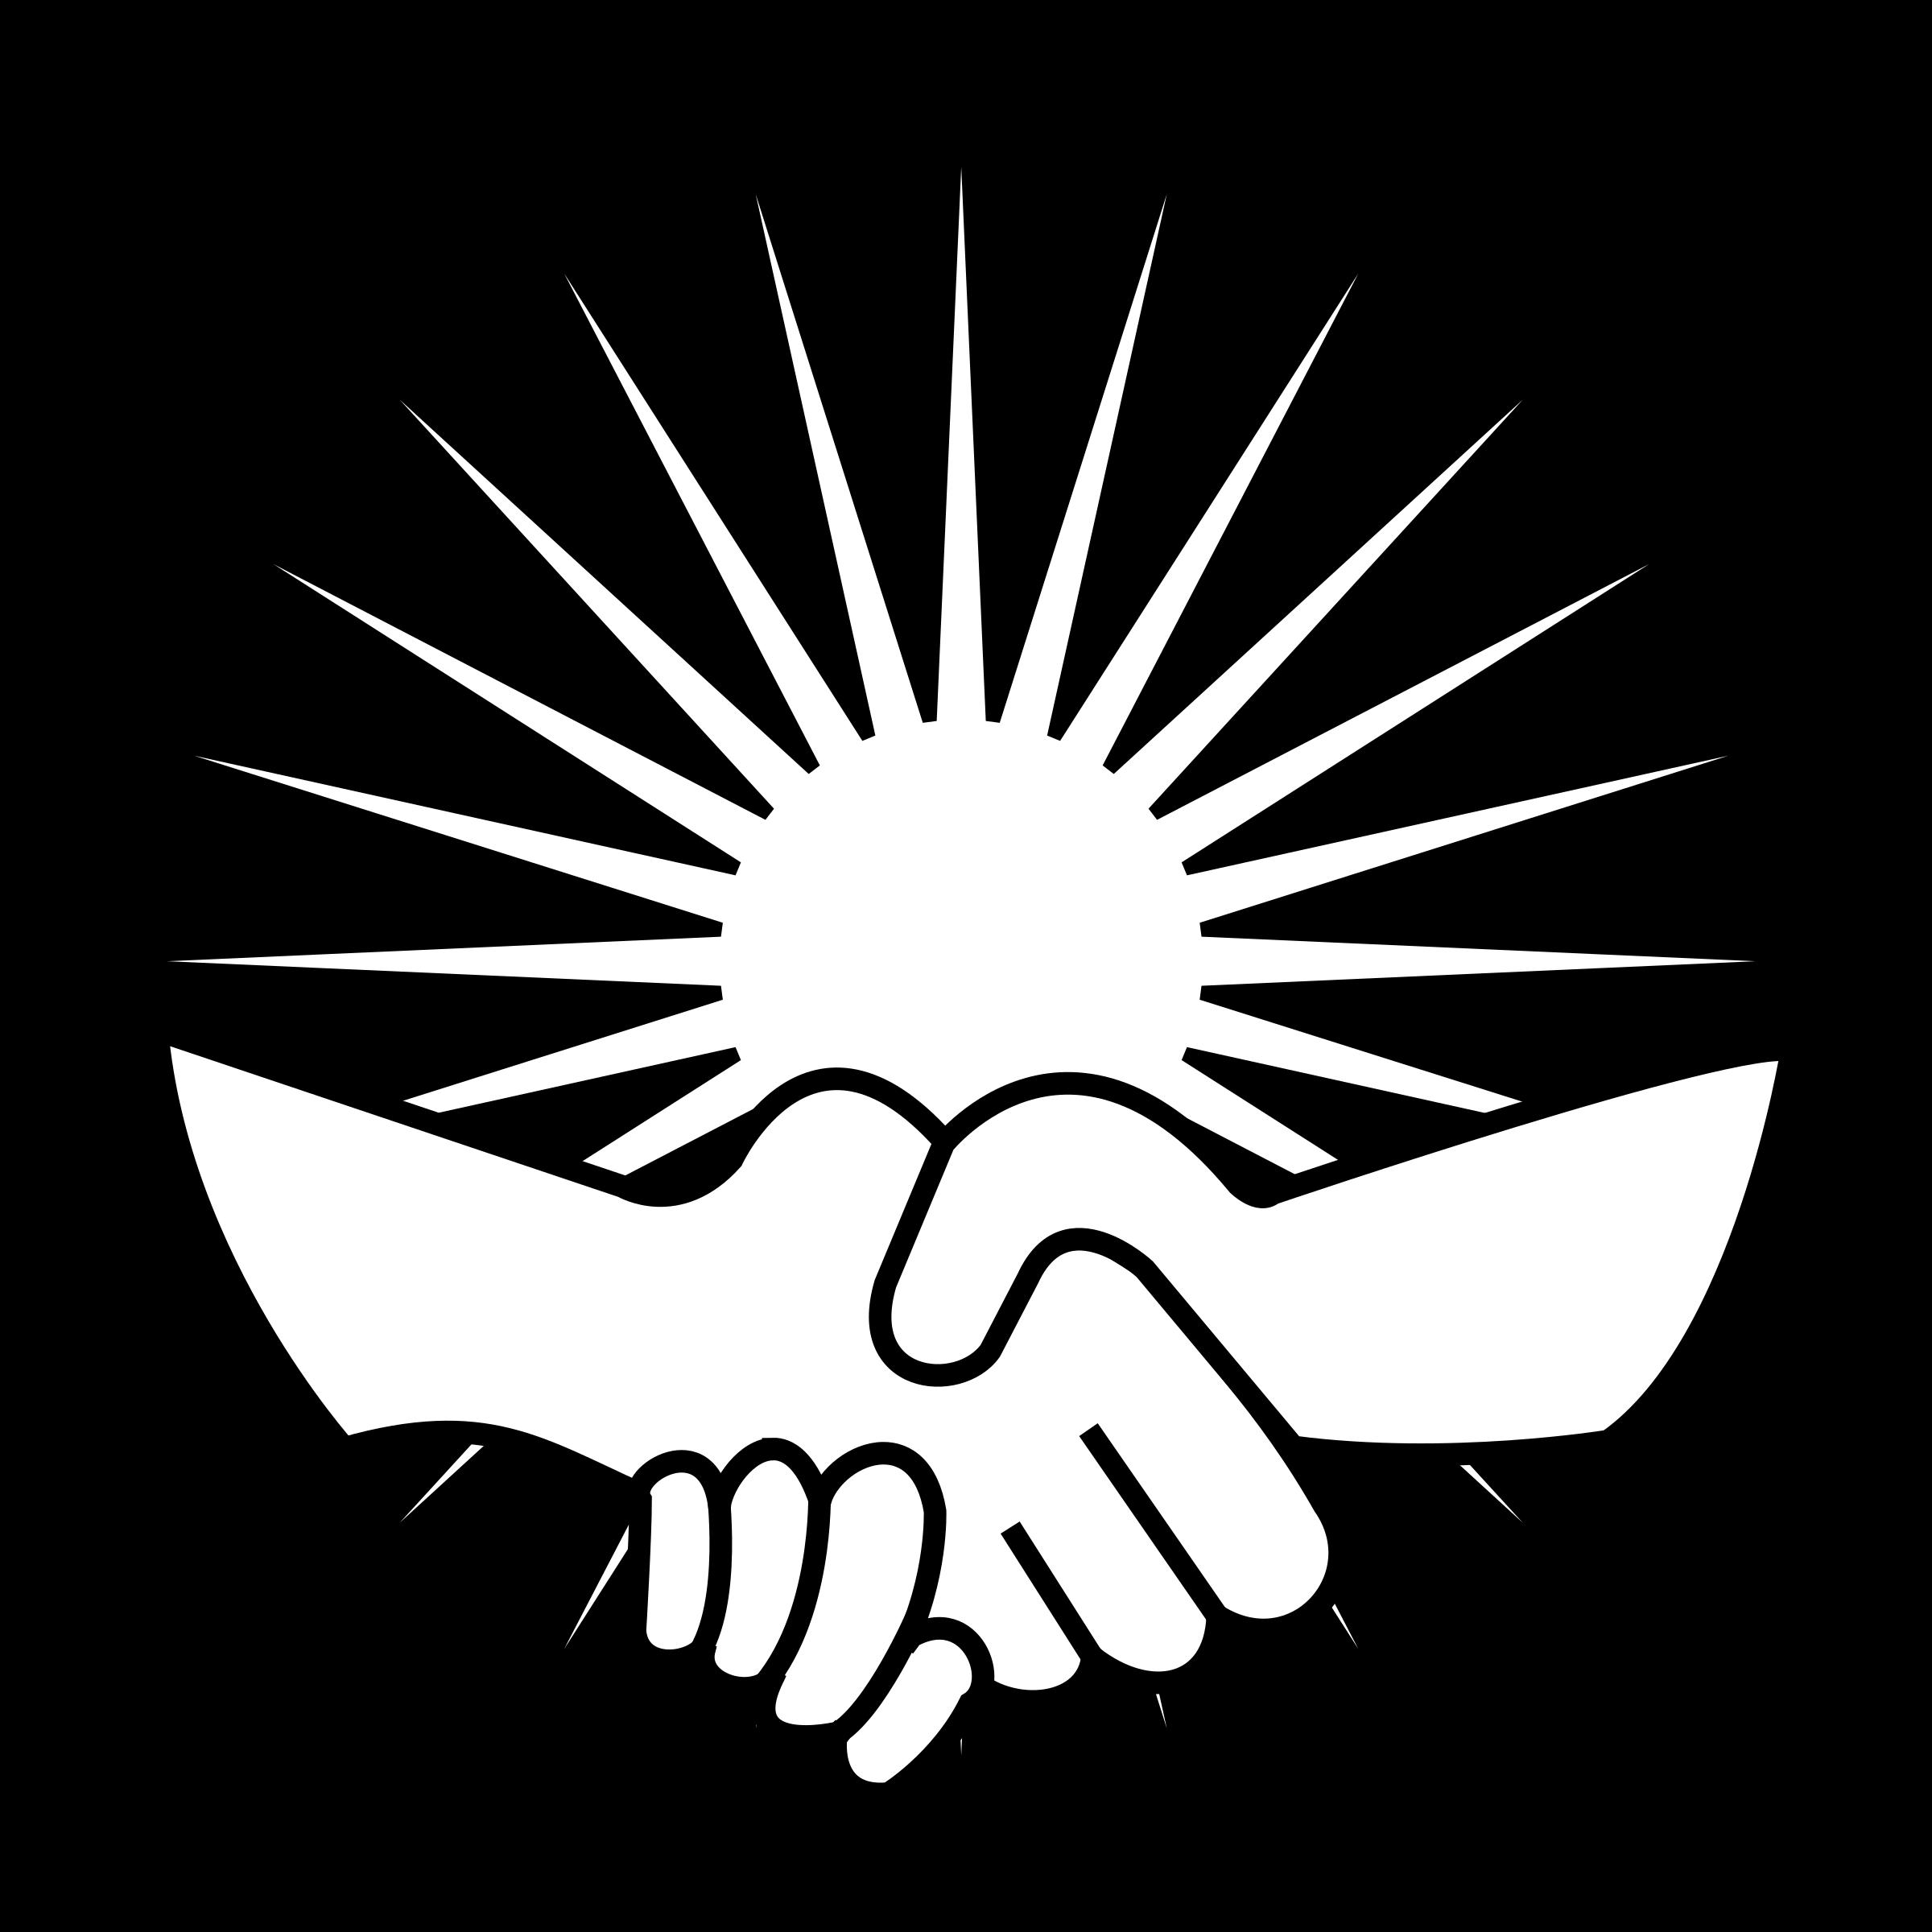 Handshake clipart business customer. Big image png